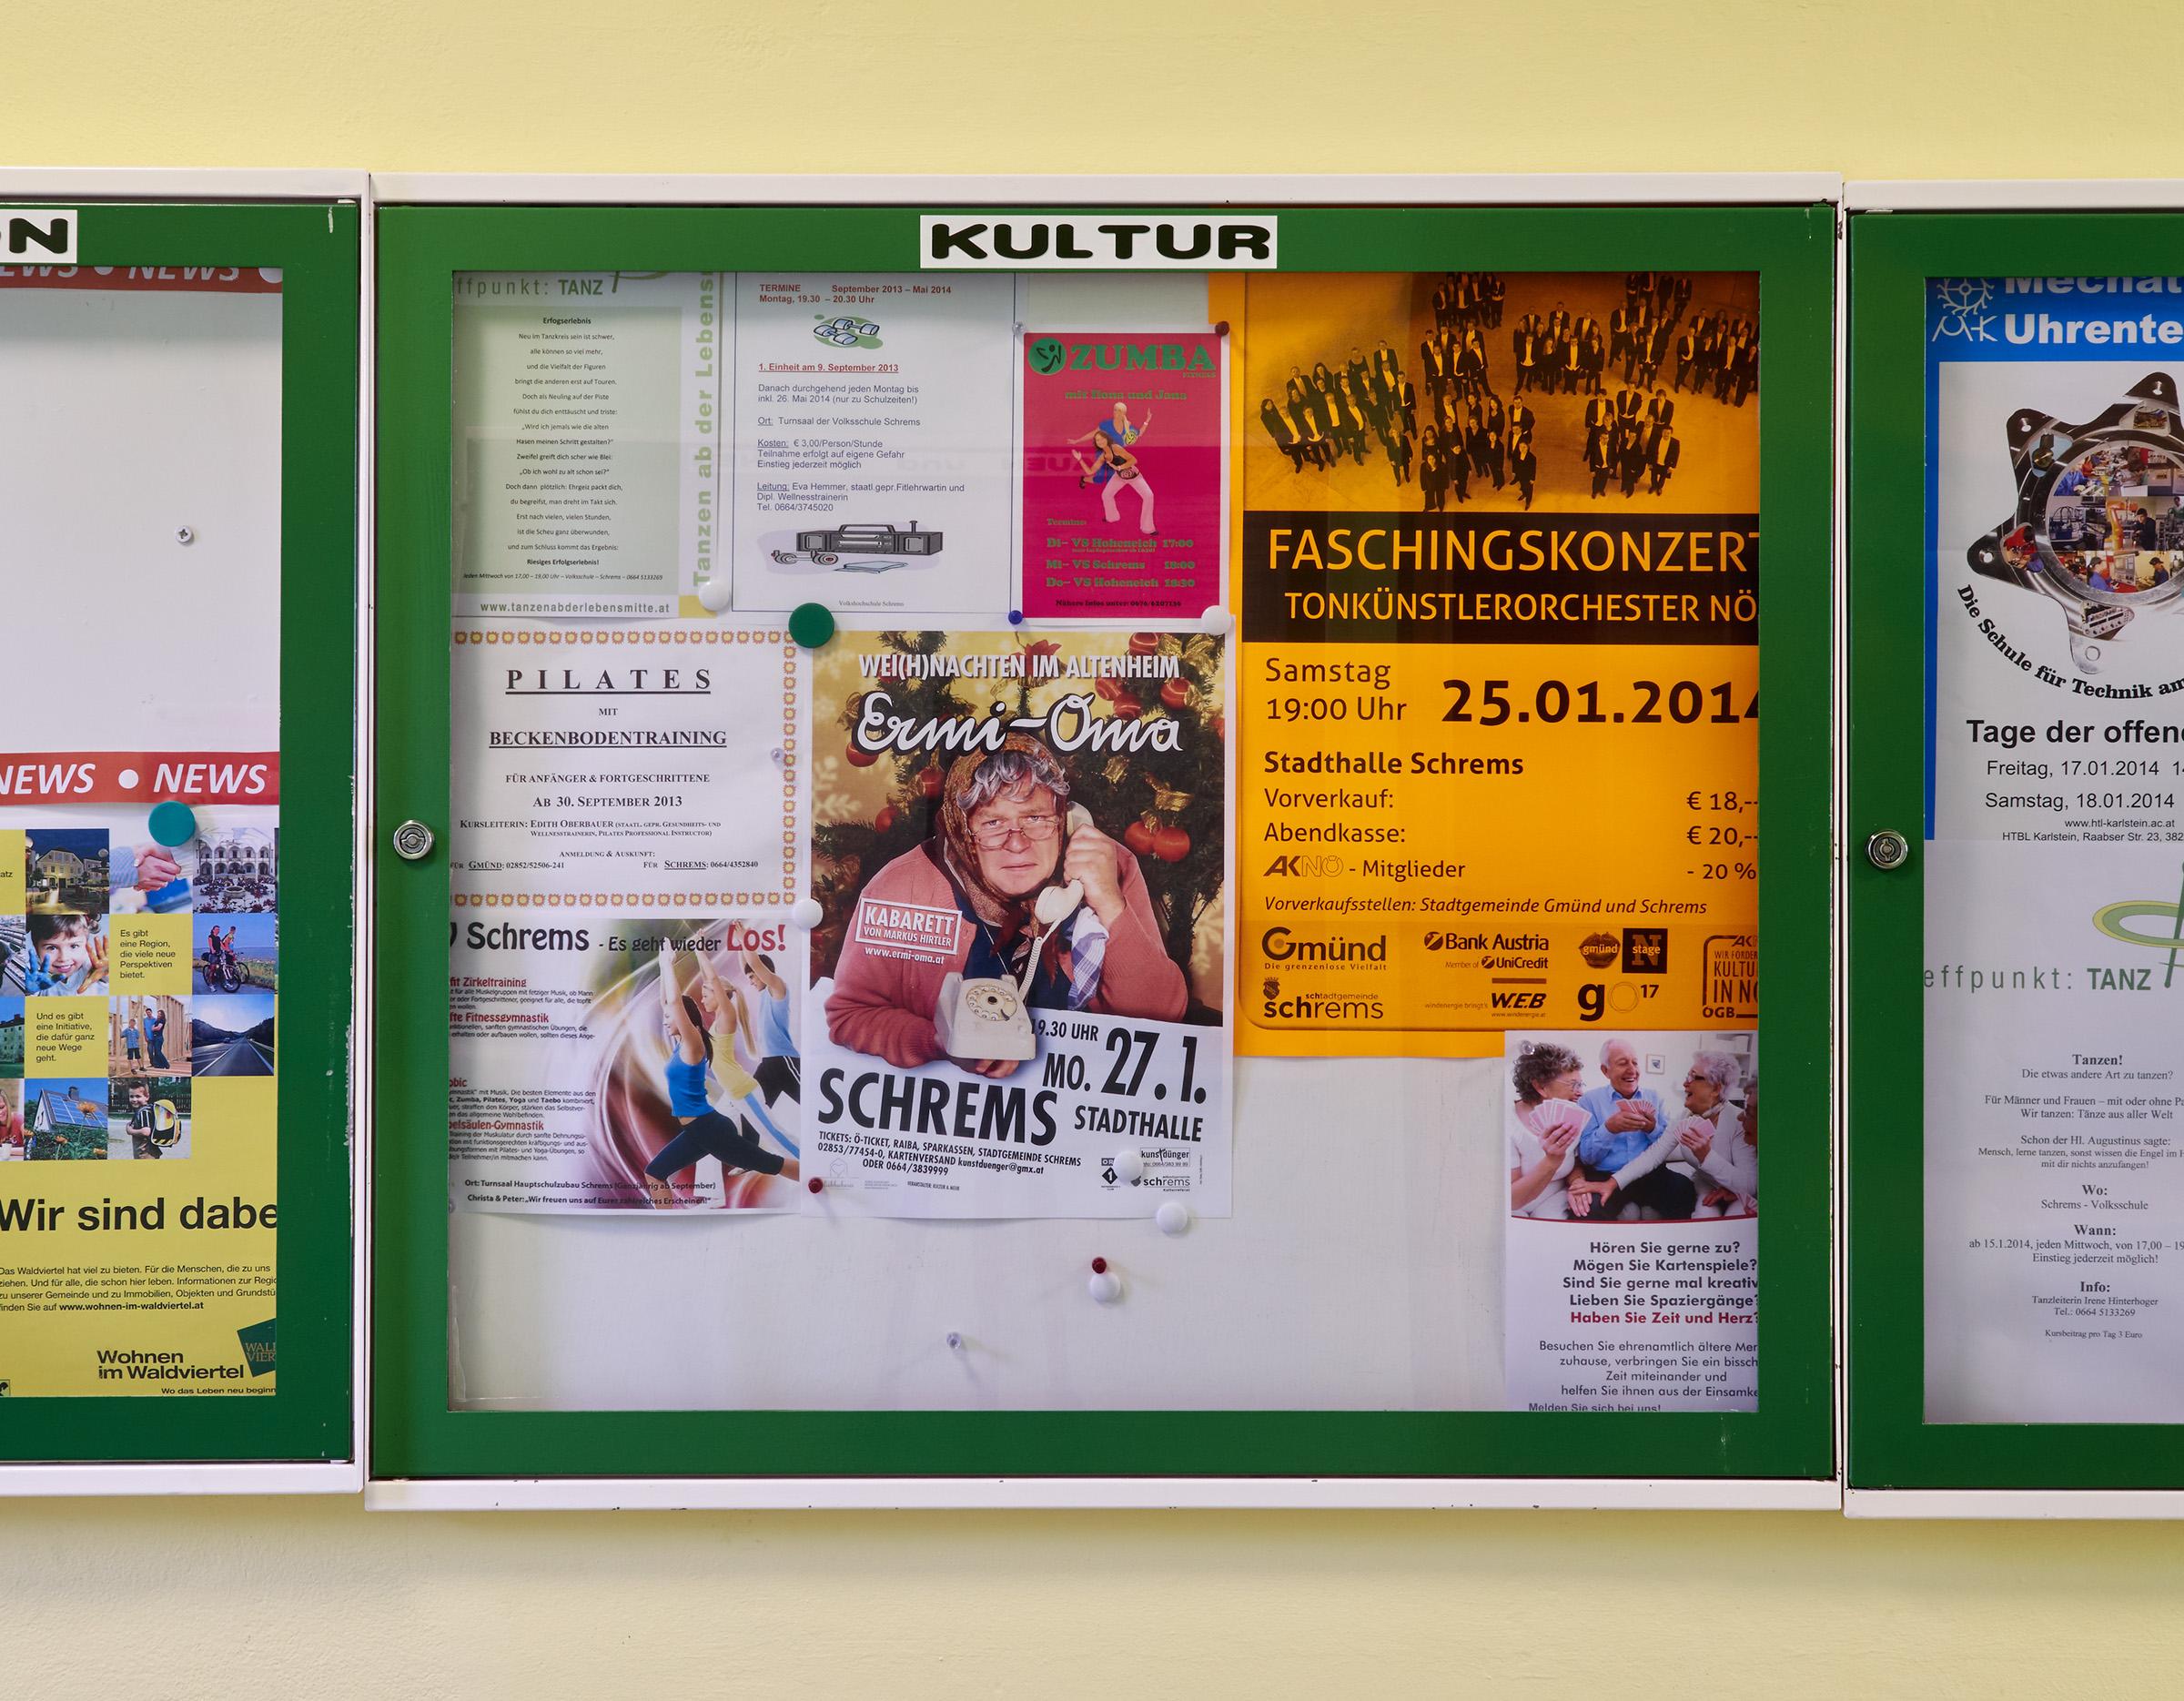 Schrems Kultur nah 2014-01-19.jpg